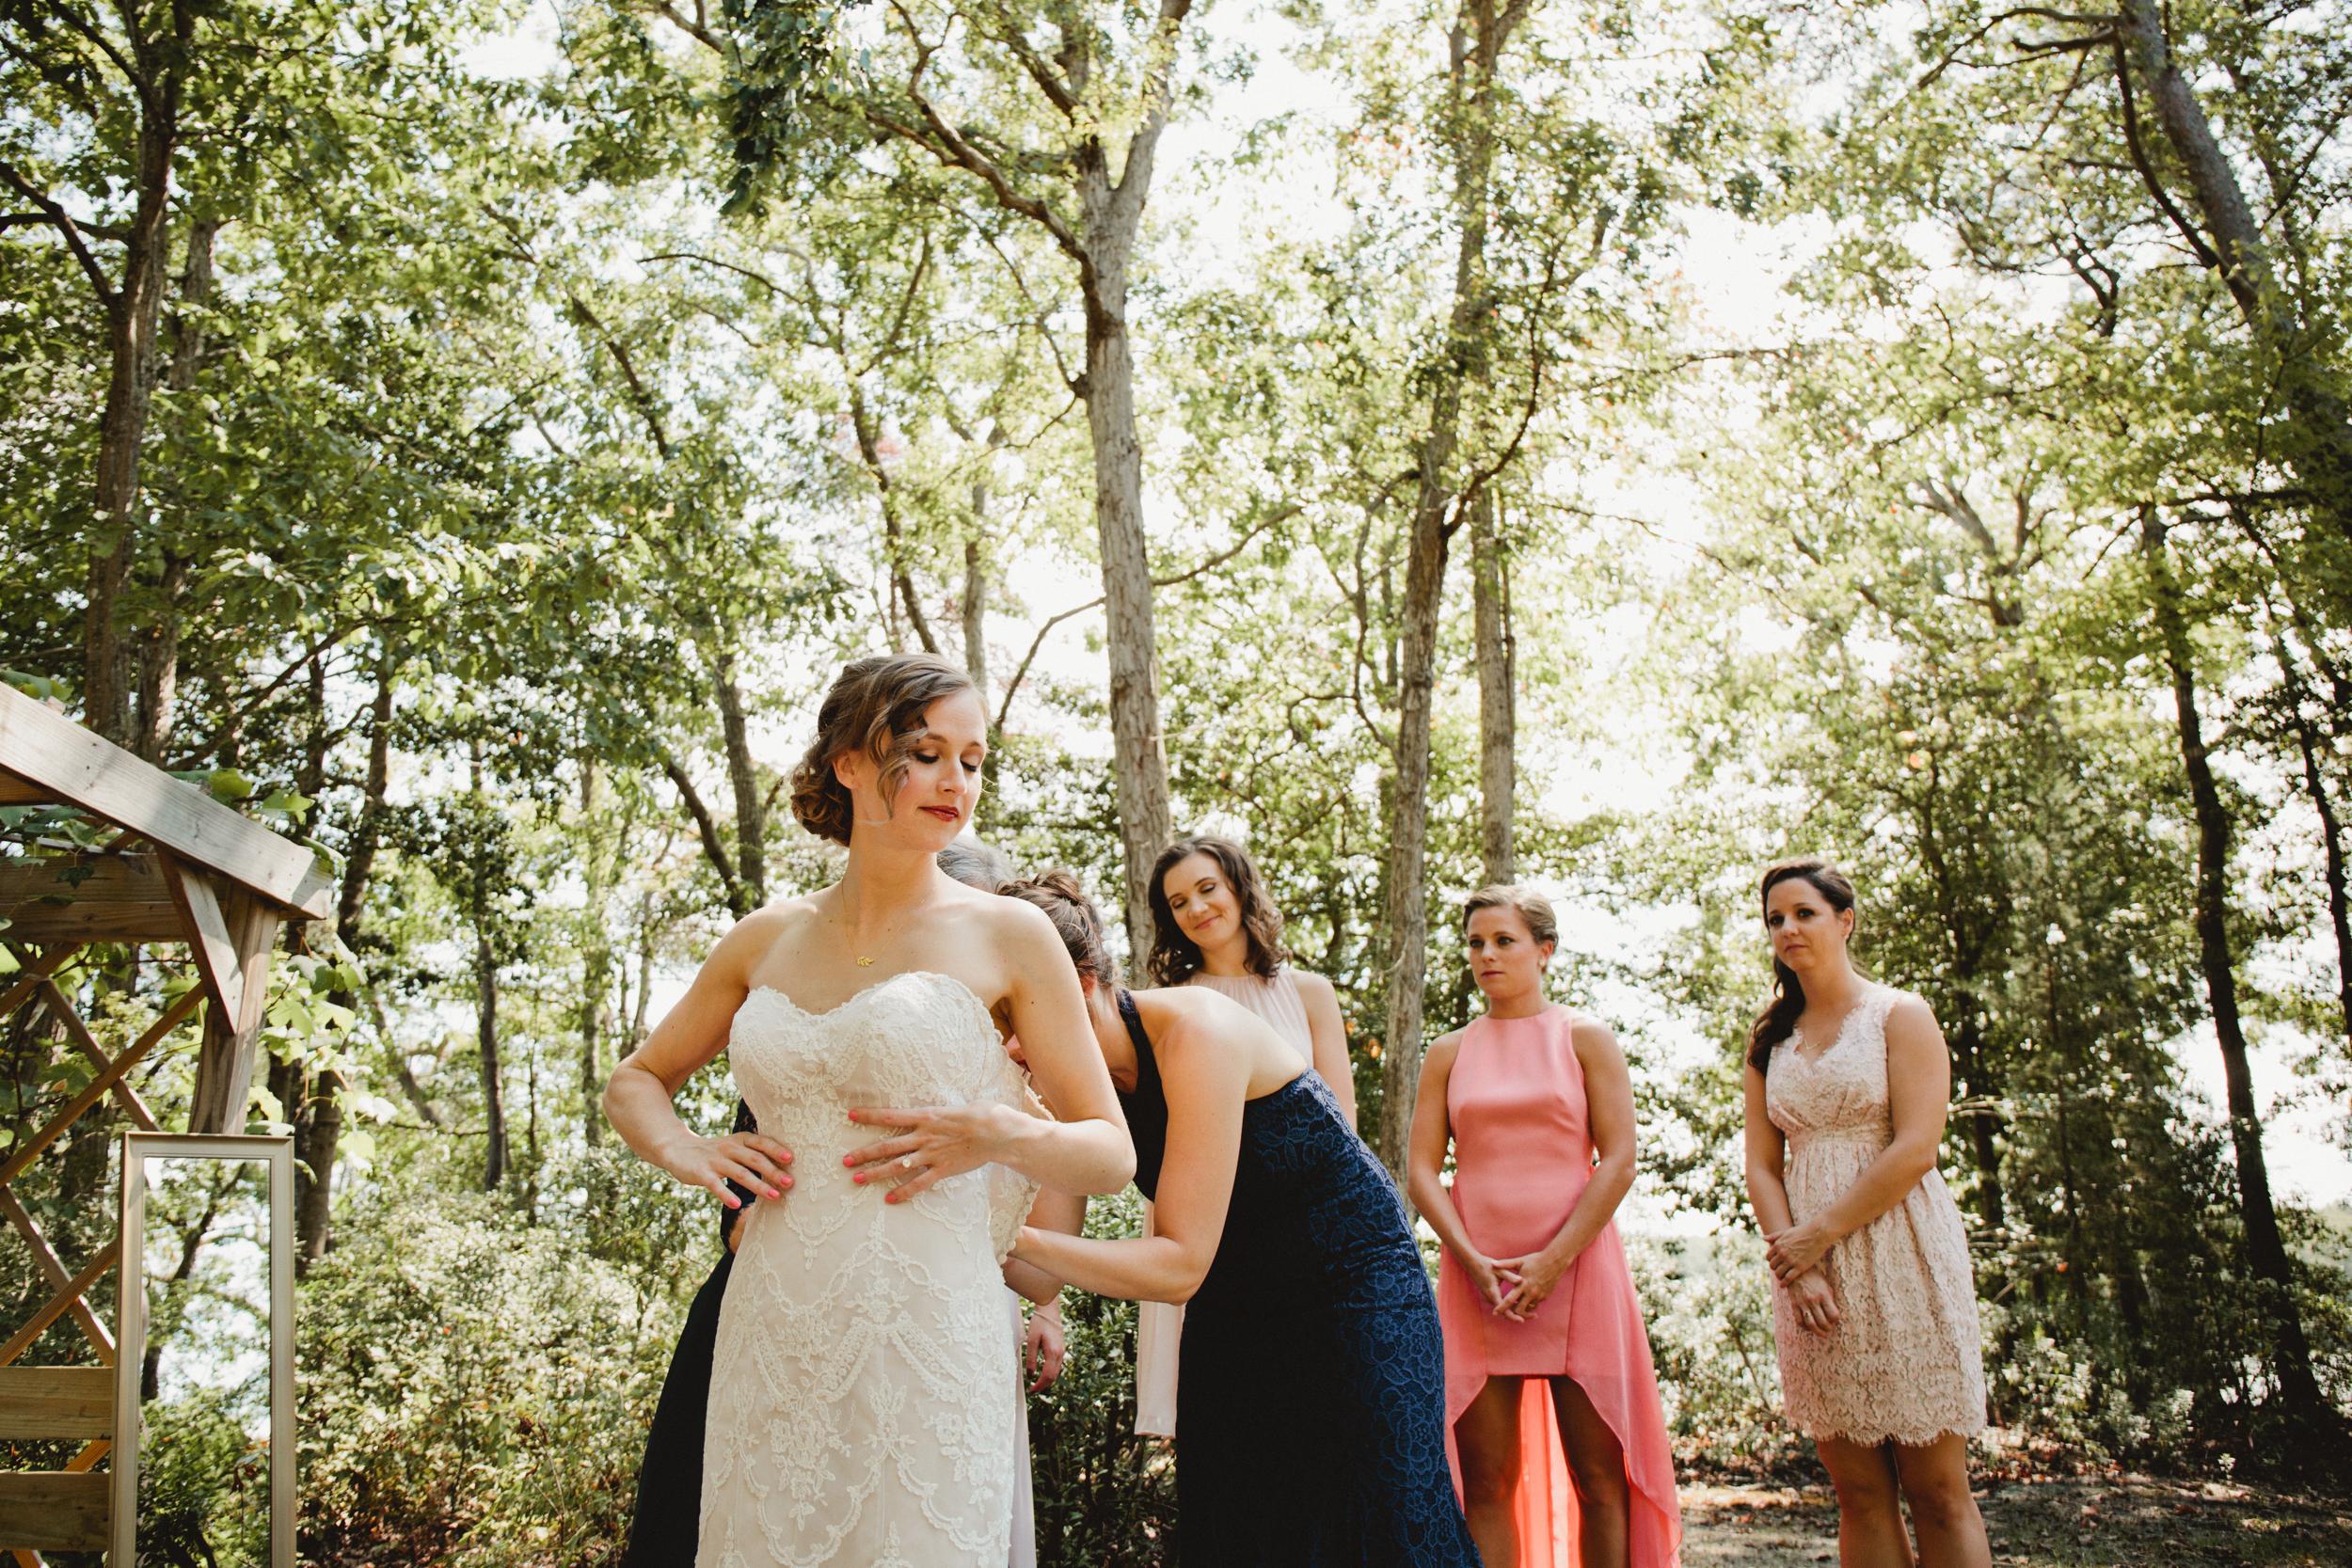 Maine-Wedding-Photographer-940.jpg